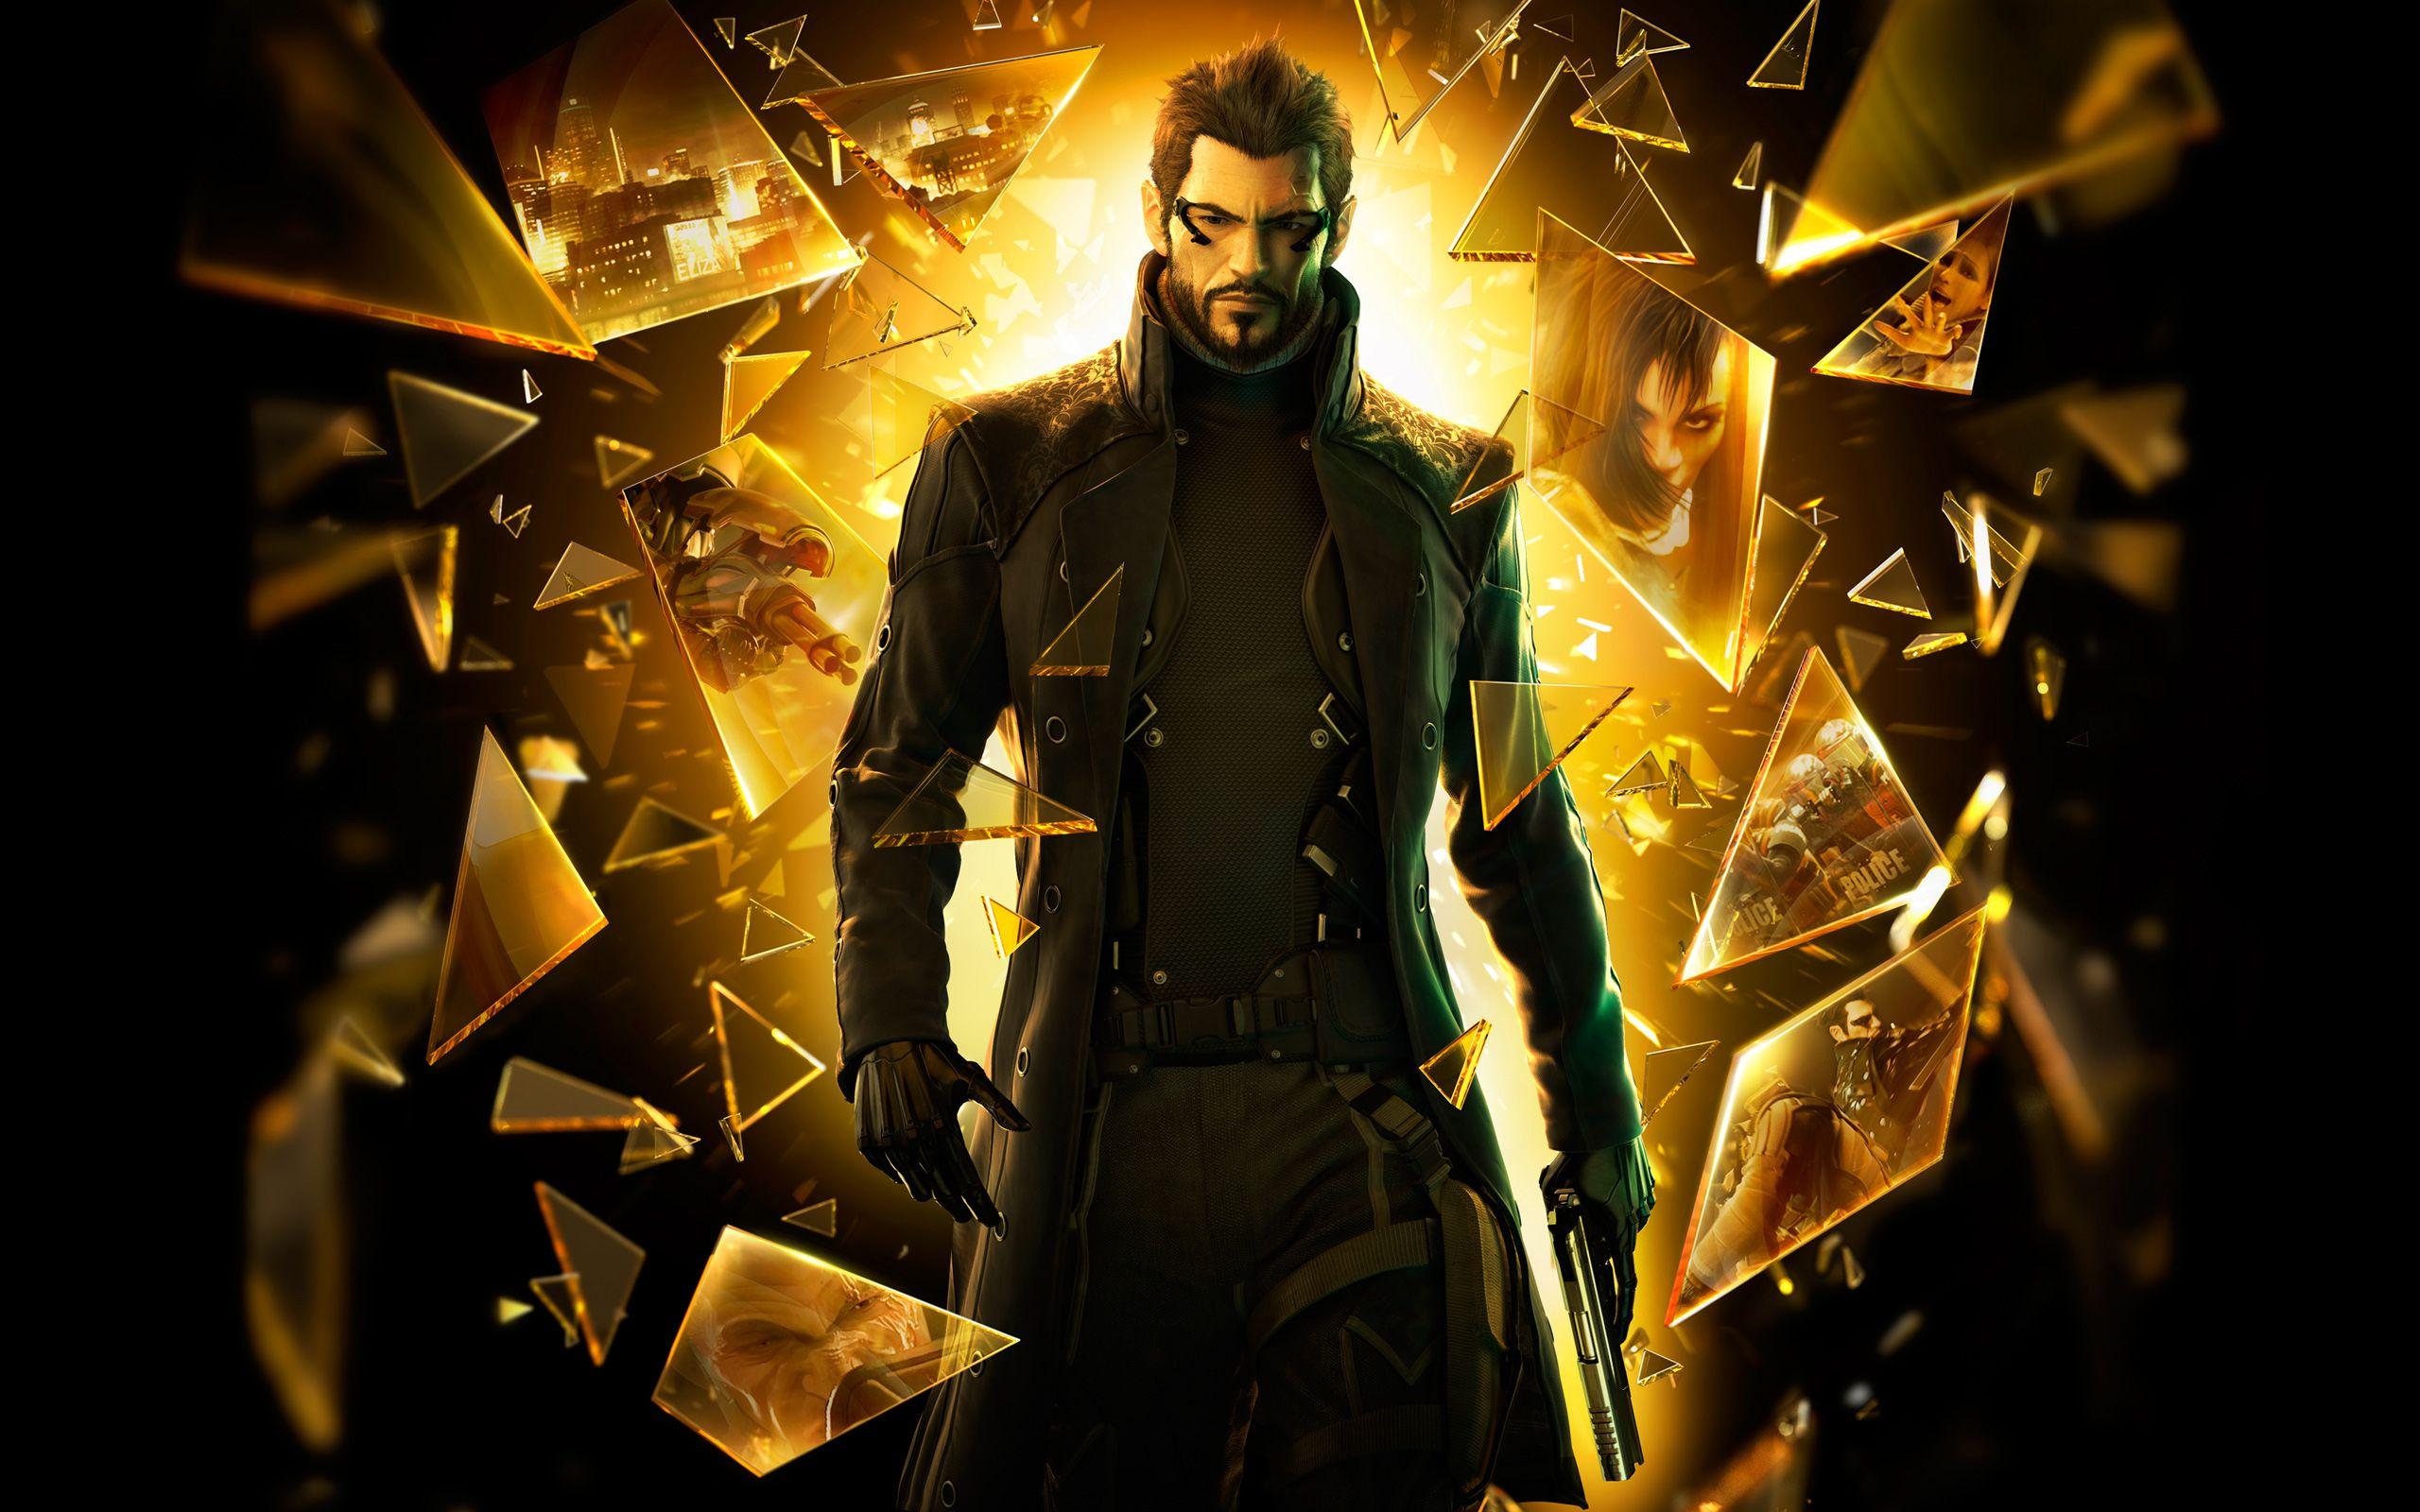 97 Deus Ex Human Revolution Hd Wallpapers Backgrounds 4usky In 2020 Deus Ex Mankind Deus Ex Mankind Divided Deus Ex